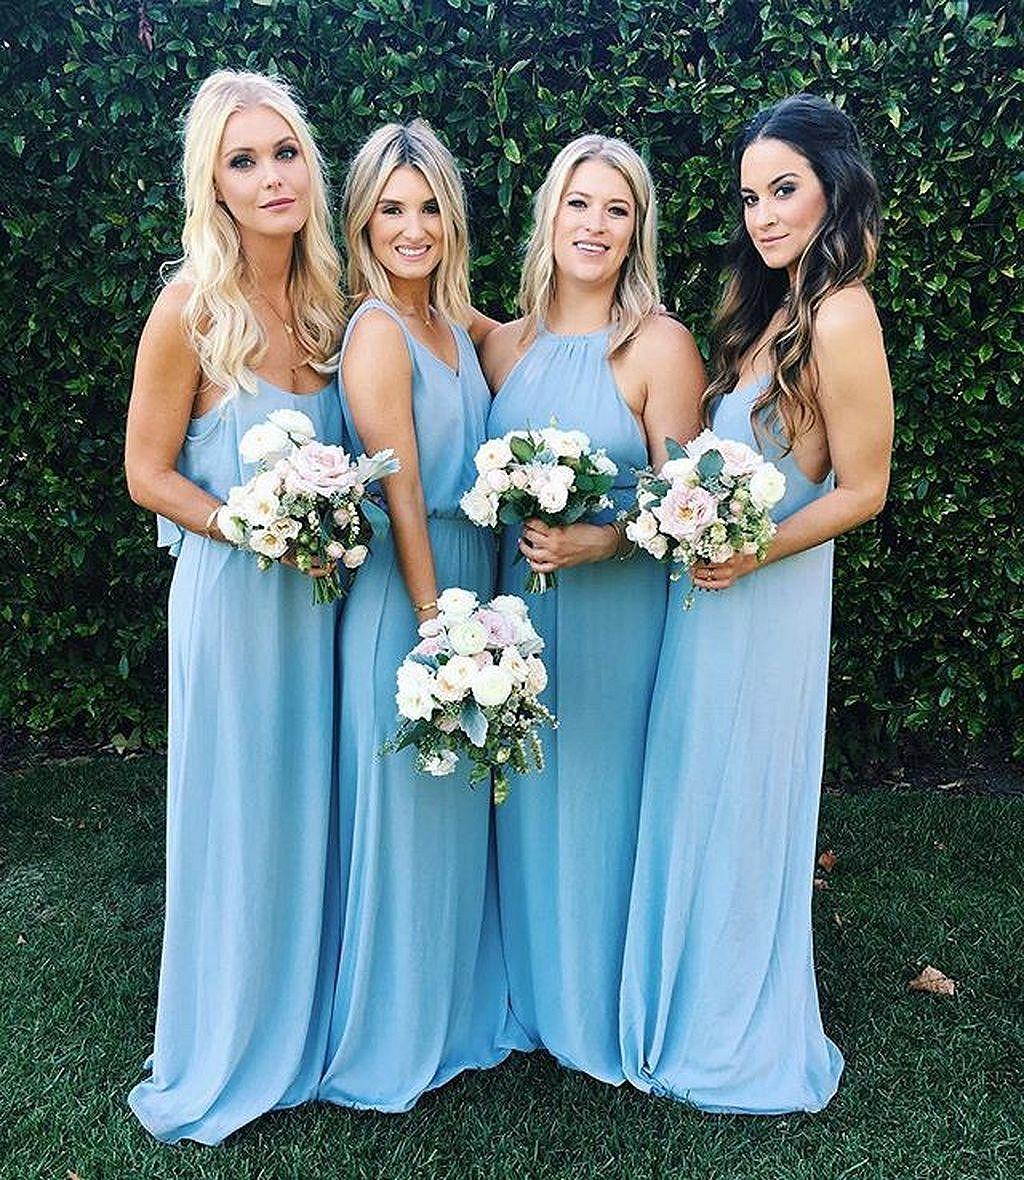 50+ Elegant Bridesmaid Dresses Ideas | Dress ideas, Elegant and Wedding